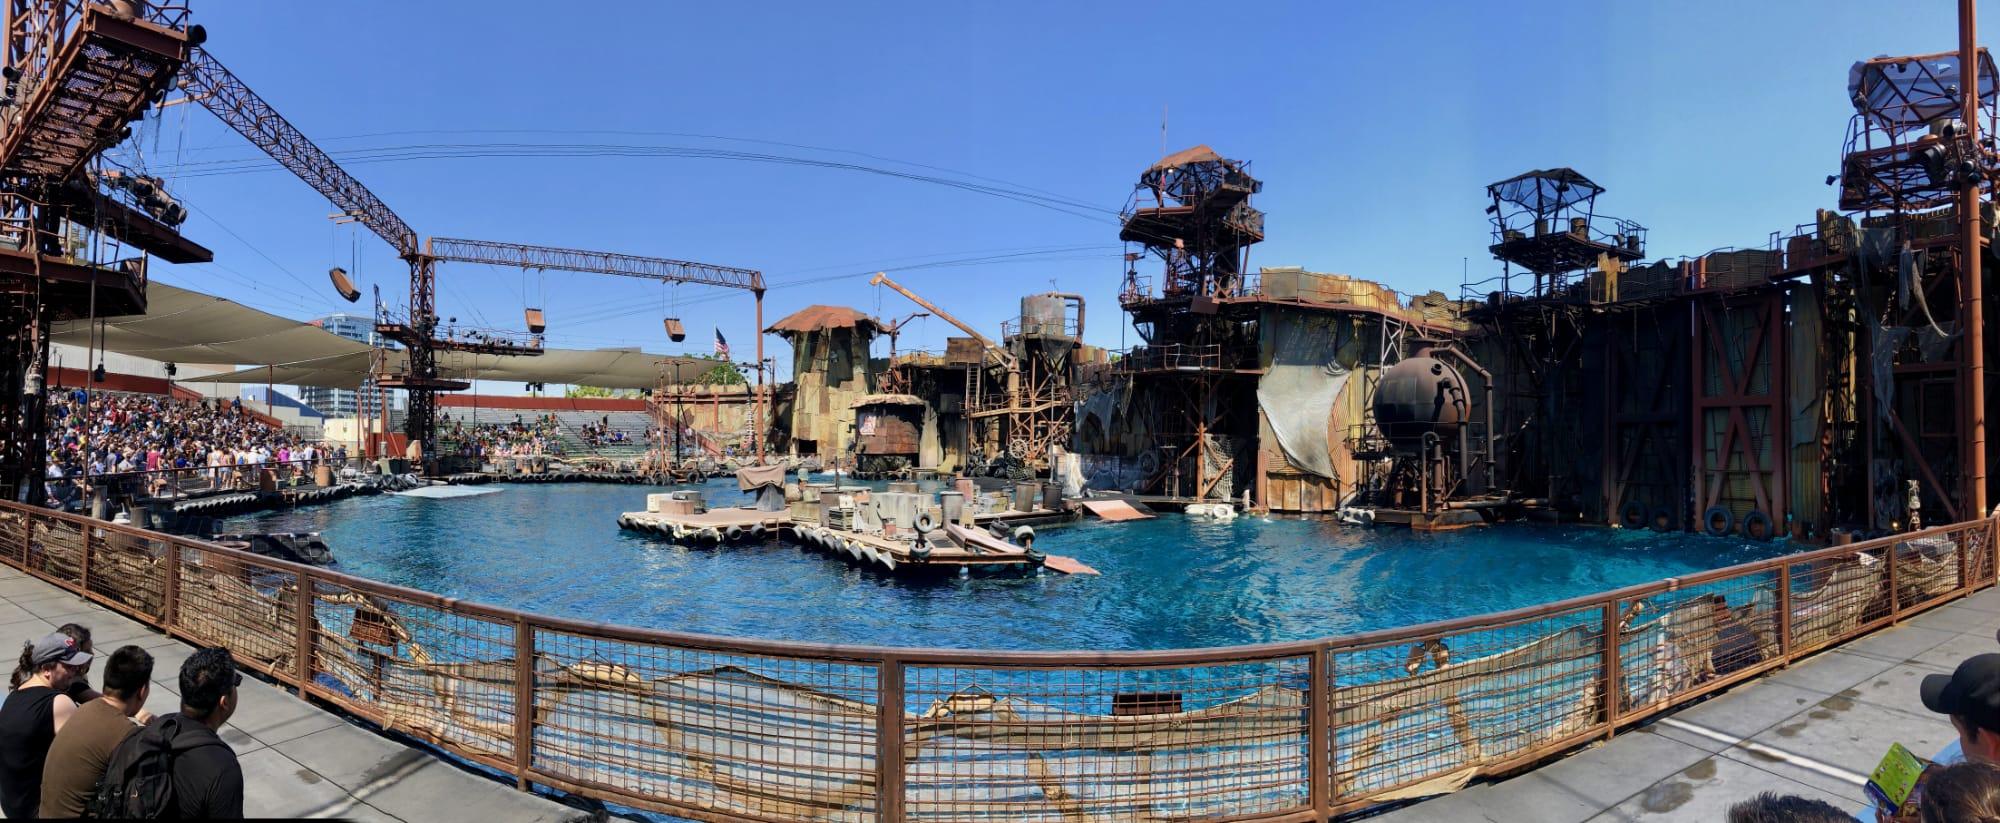 Waterworld Stunt Show, Universal Studios